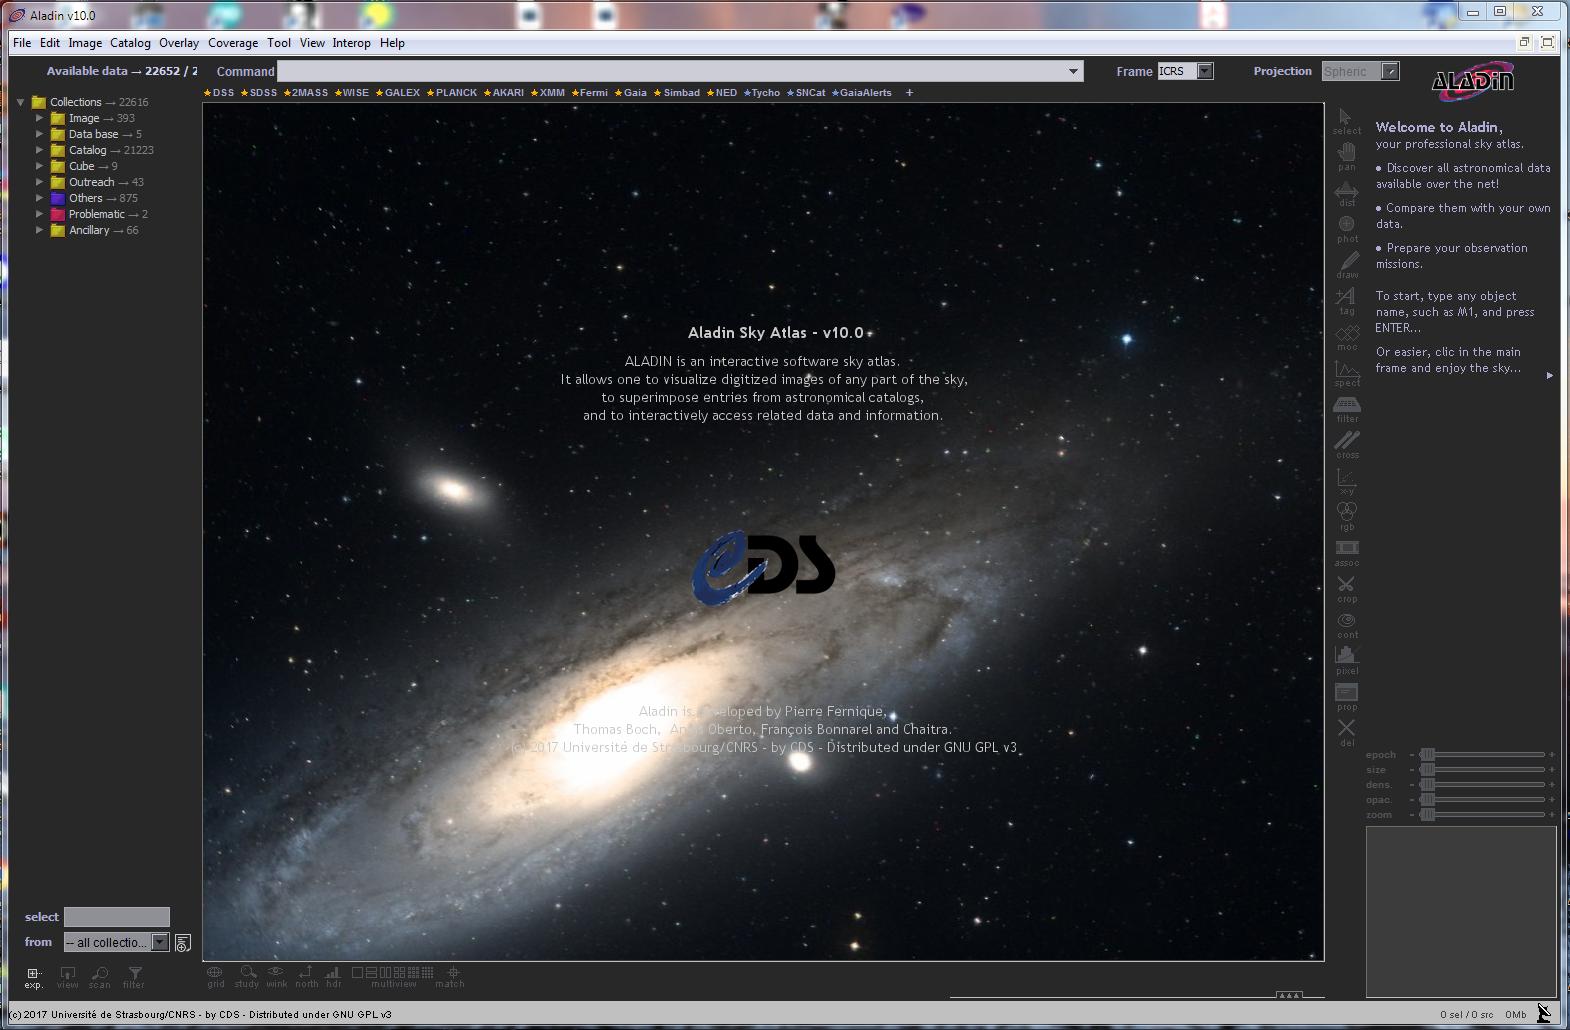 Aladin Sky Atlas - Wikipedia